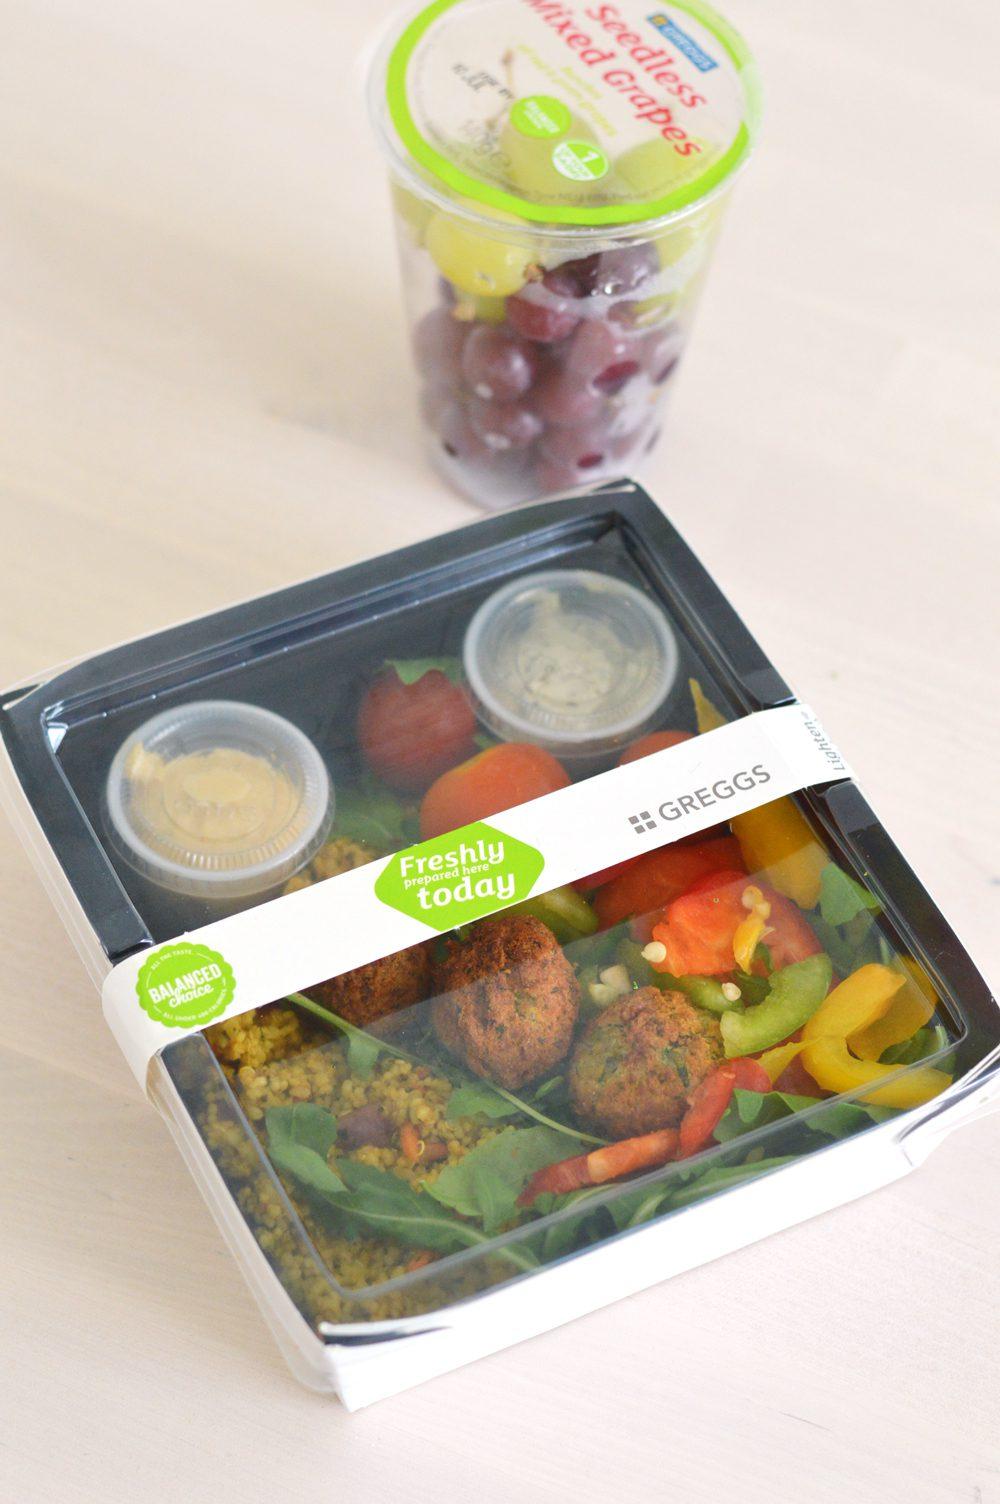 Greggs salad 1